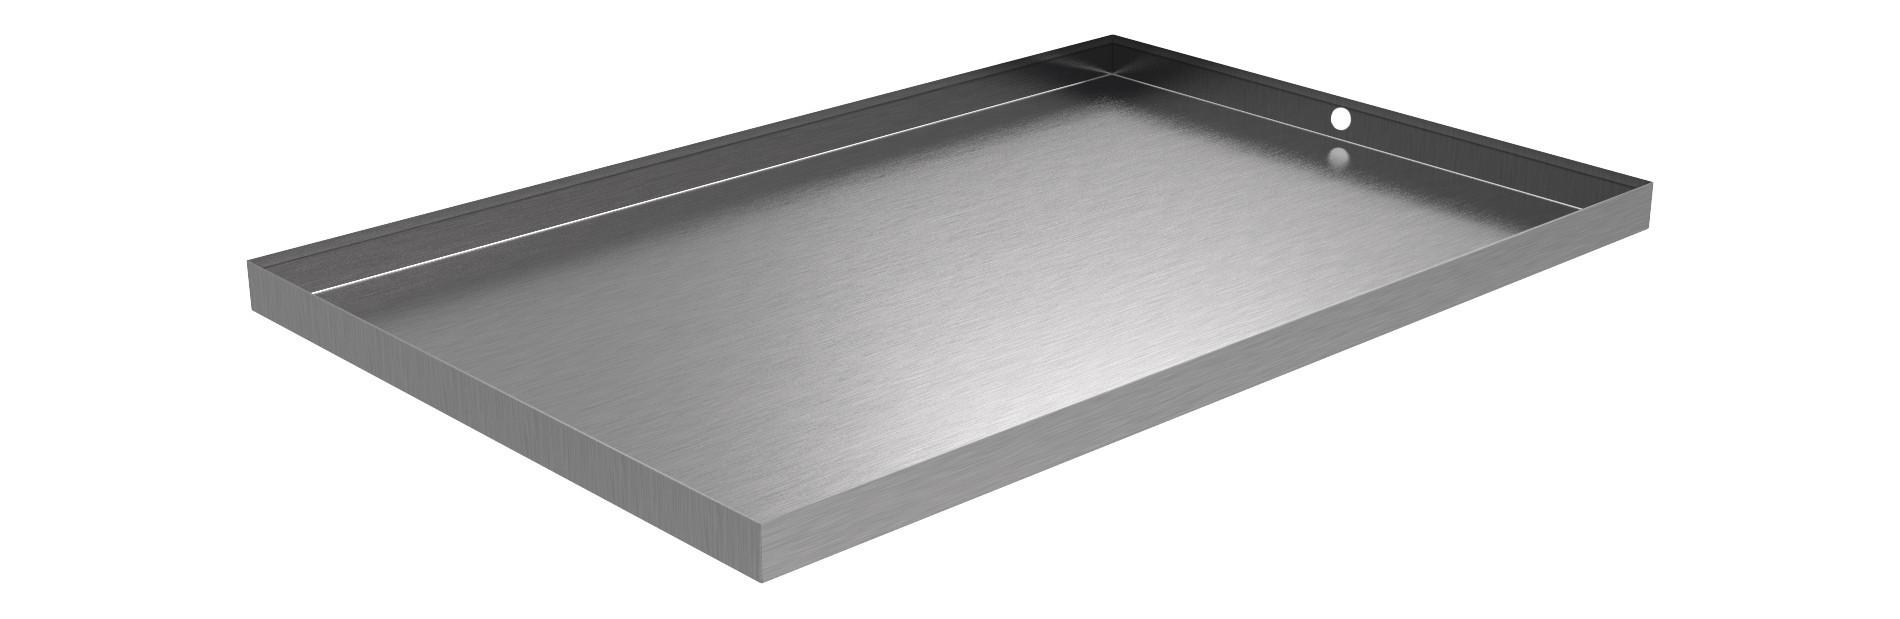 Stainless Steel Drip Pan Killarney Metals